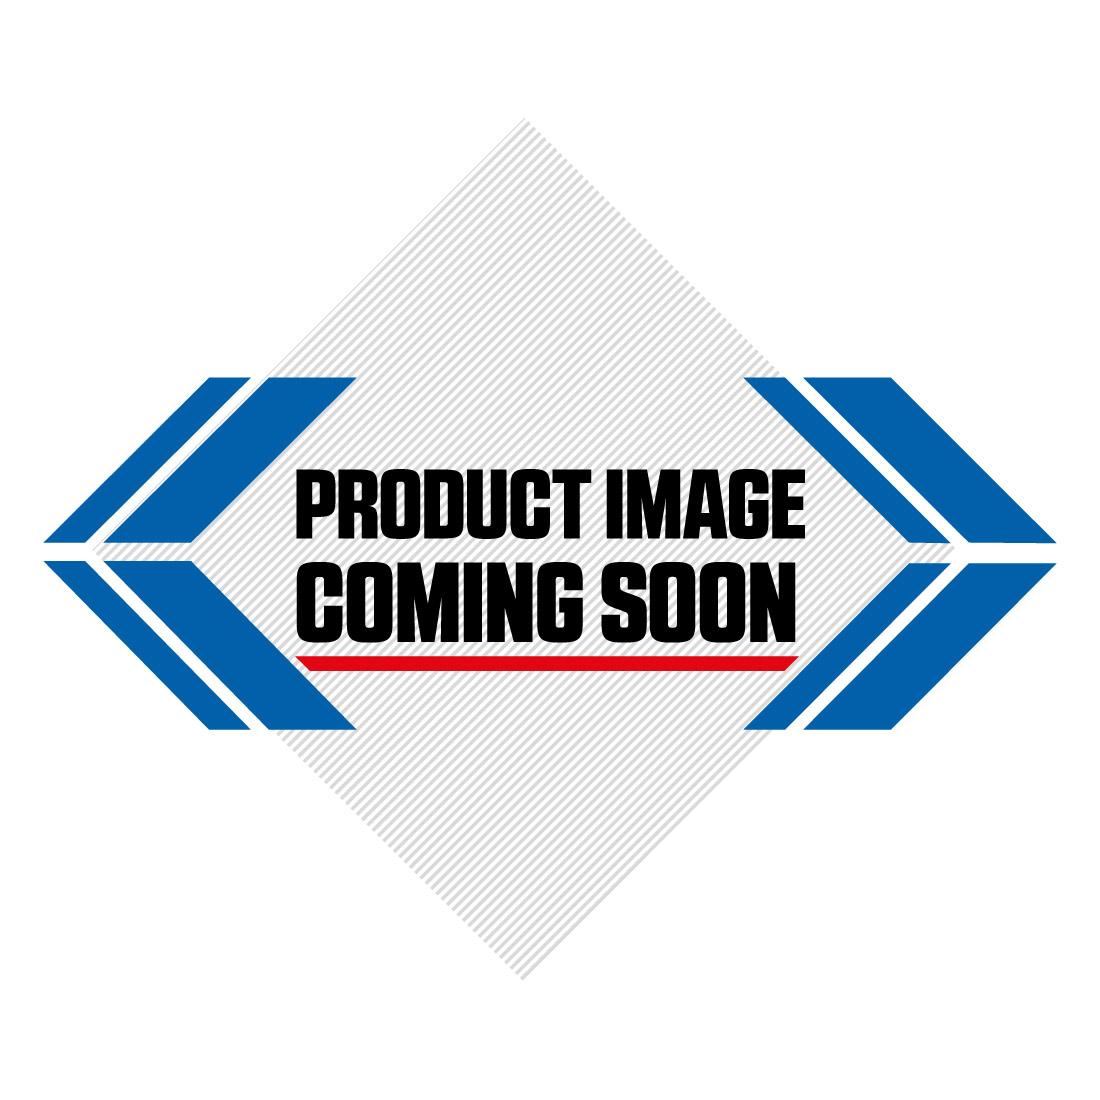 Sidi Black Ash Crossfire 3 SRS MX Boots Image-1>